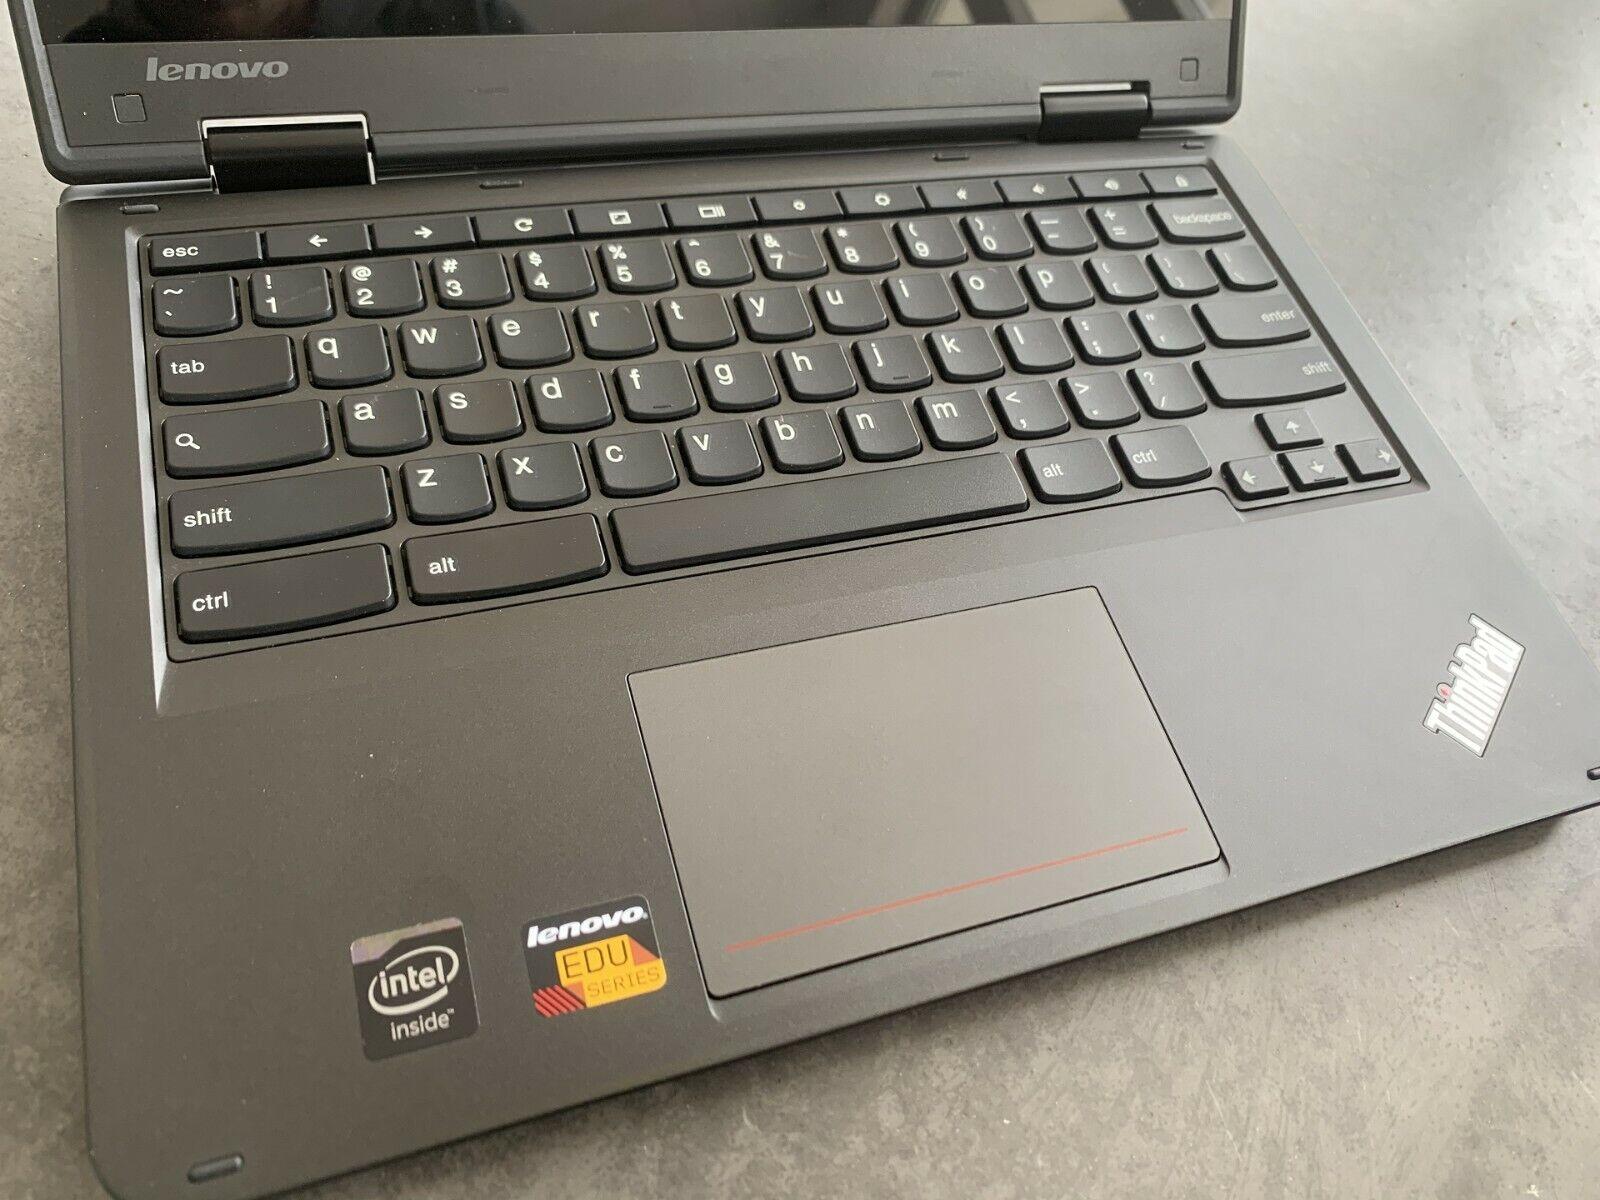 Lenovo chromebook 11e celeron quad core n2940 1.83 4gb ram 16gb ssd